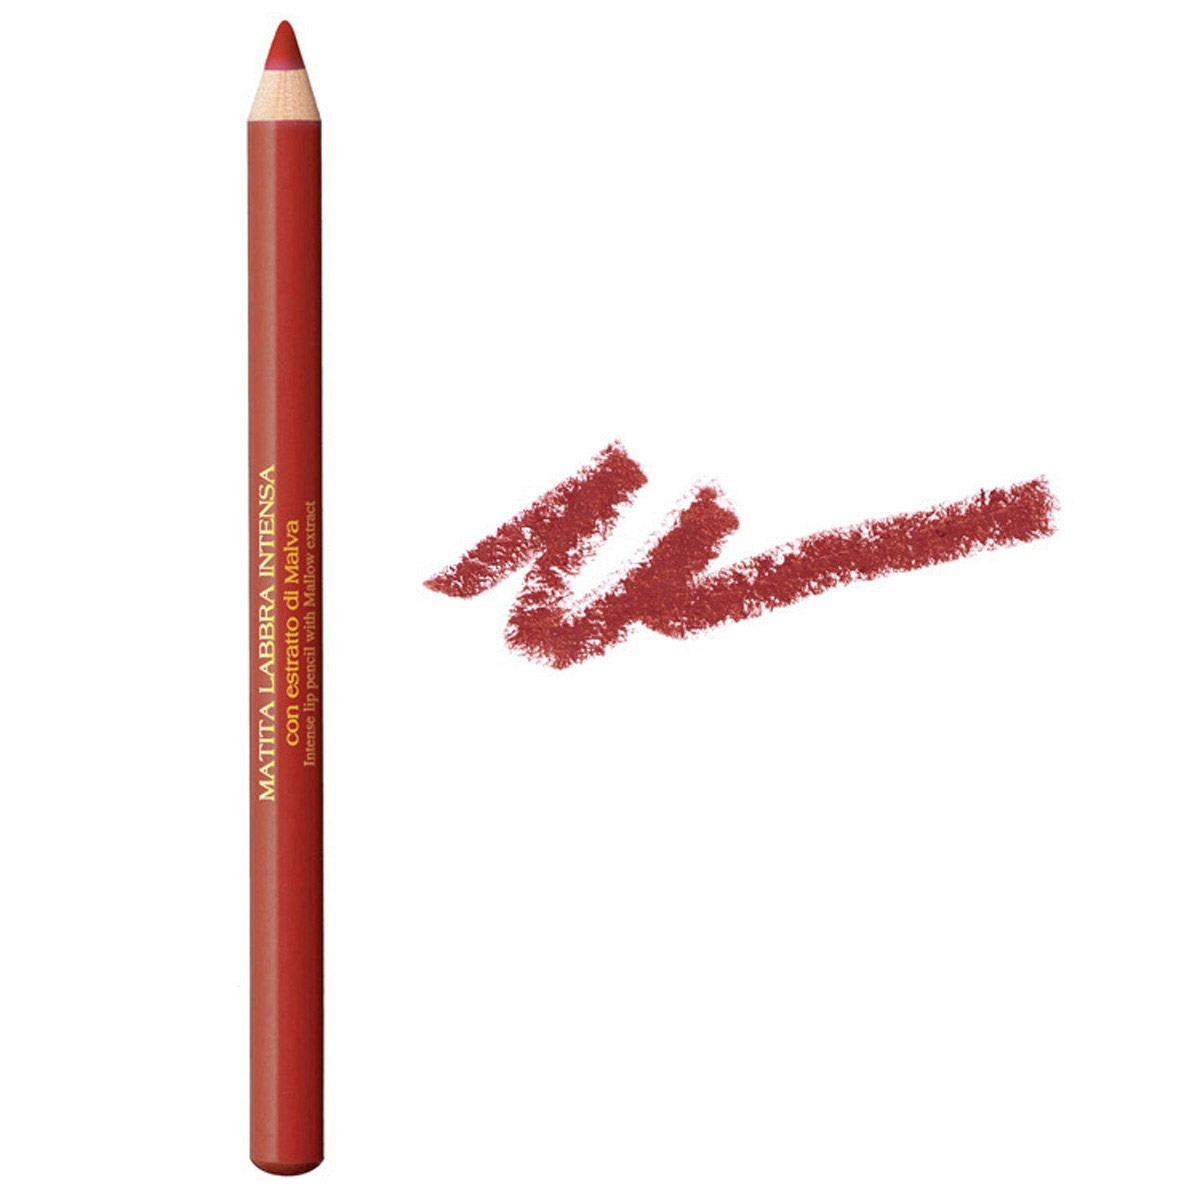 Creion cu extract de nalba, scortisoara